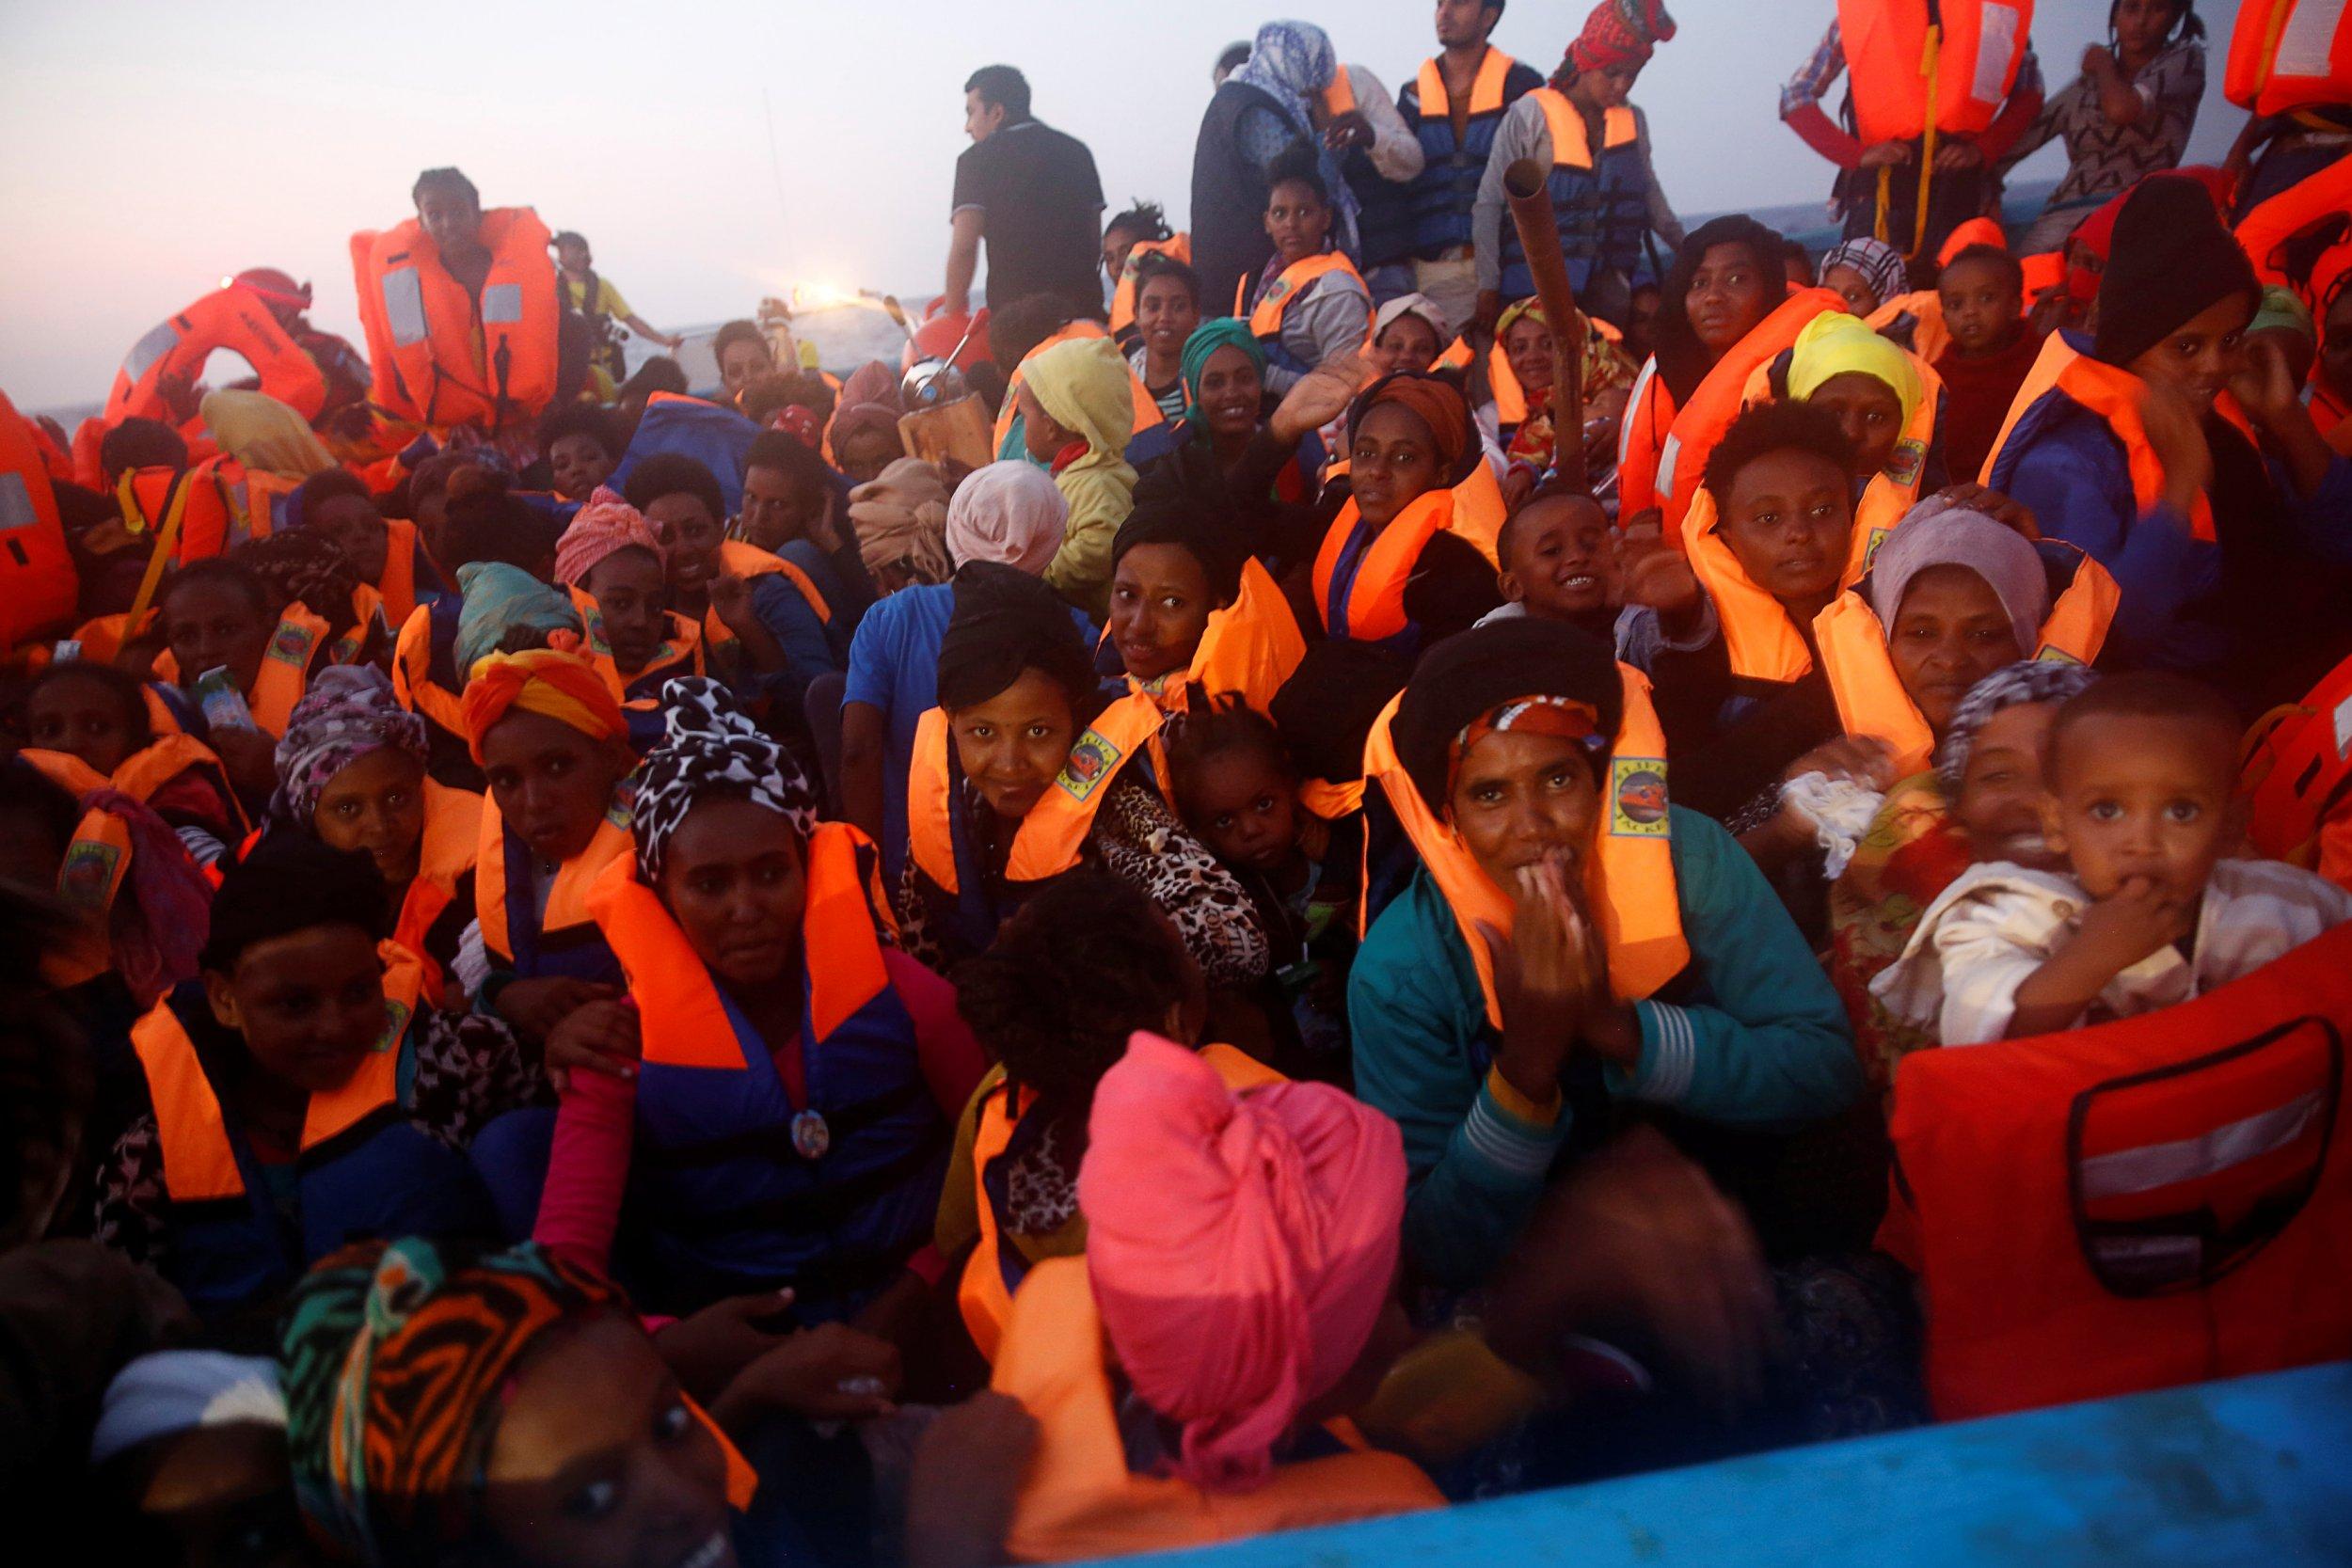 Eritrean migrants in Mediterranean Sea